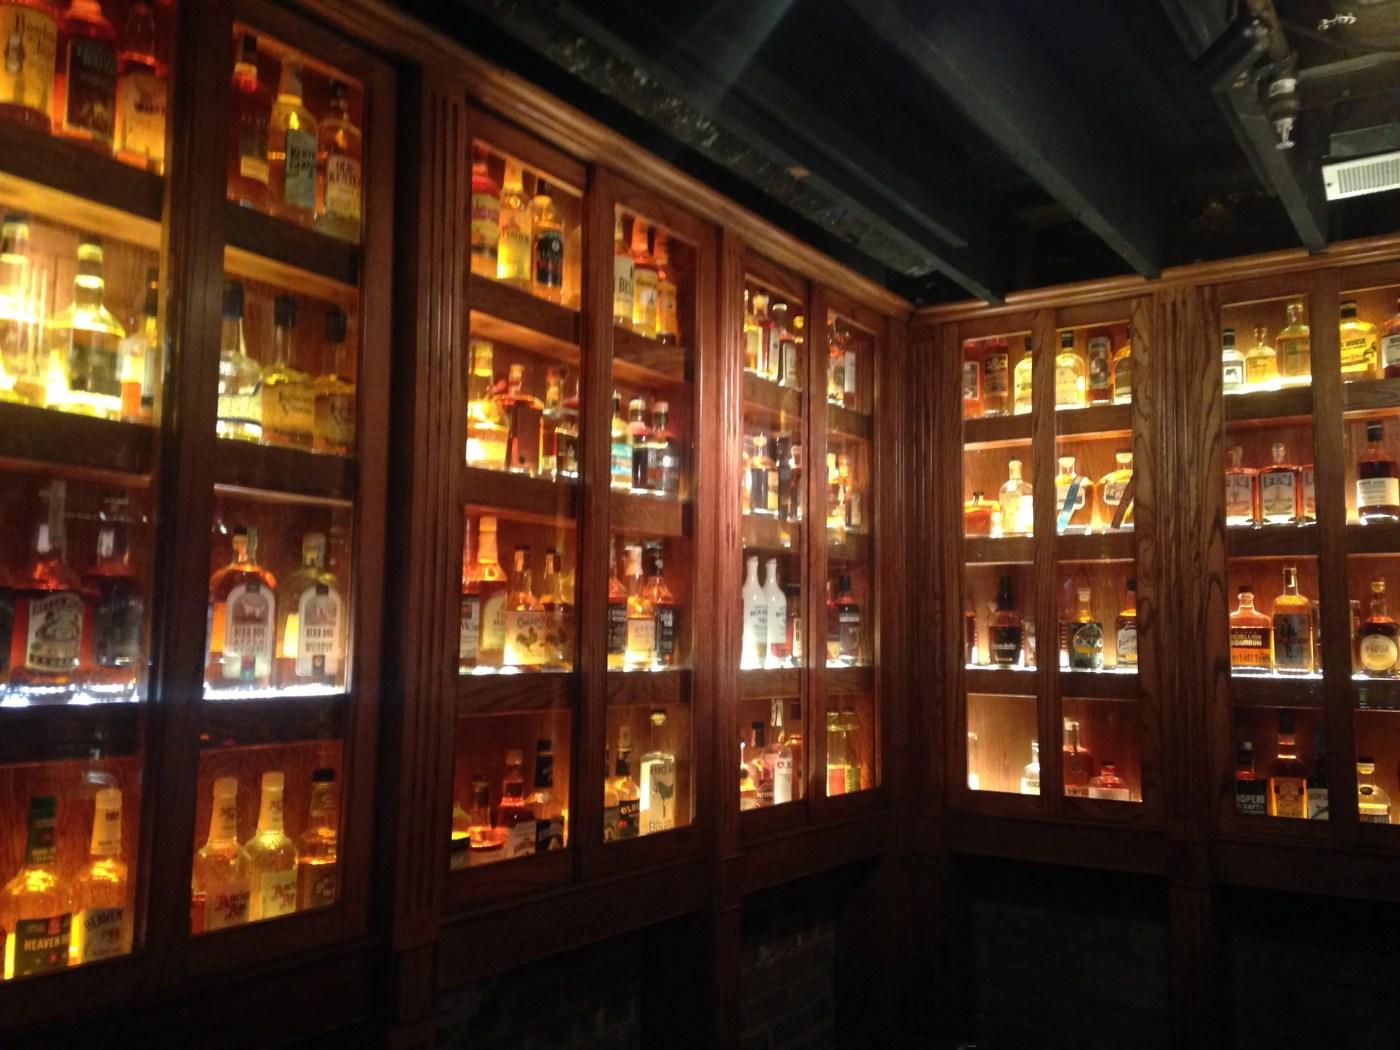 The Miller House Bar In Owensboro – bourbonveachdotcom